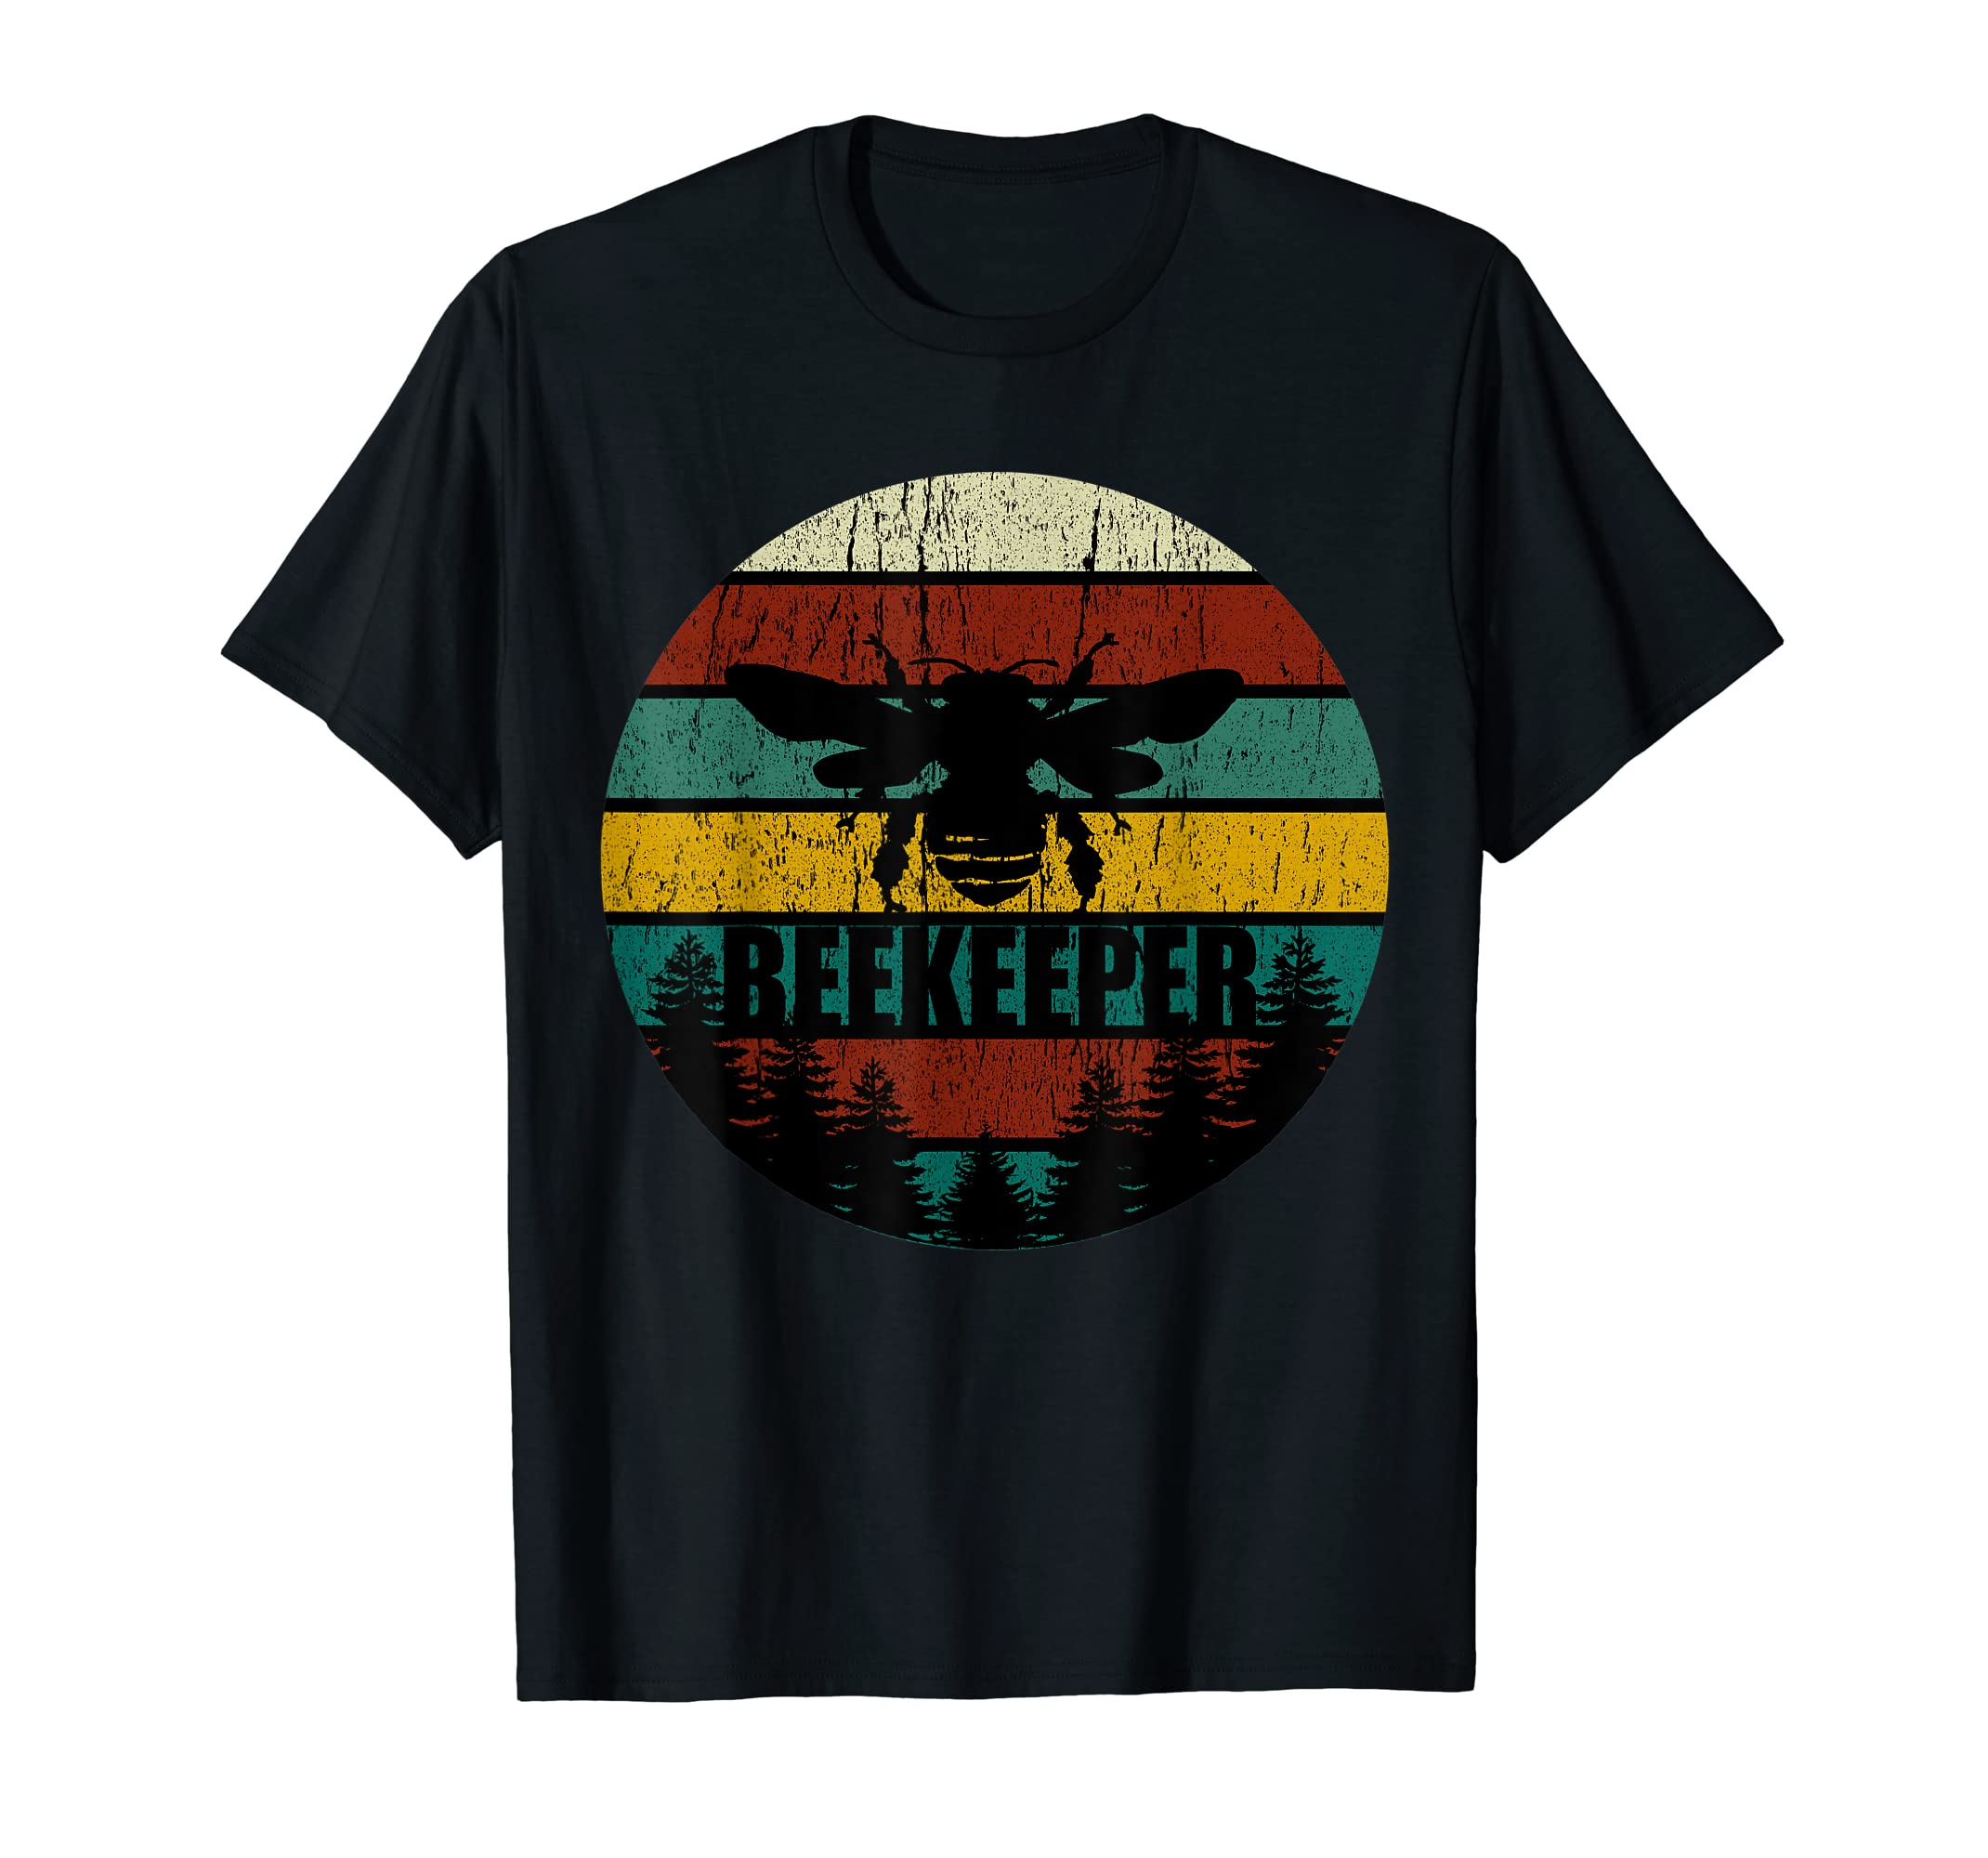 Retro Vintage Beekeeper T-Shirt Beekeeping Bee tshirt Gift-Men's T-Shirt-Black